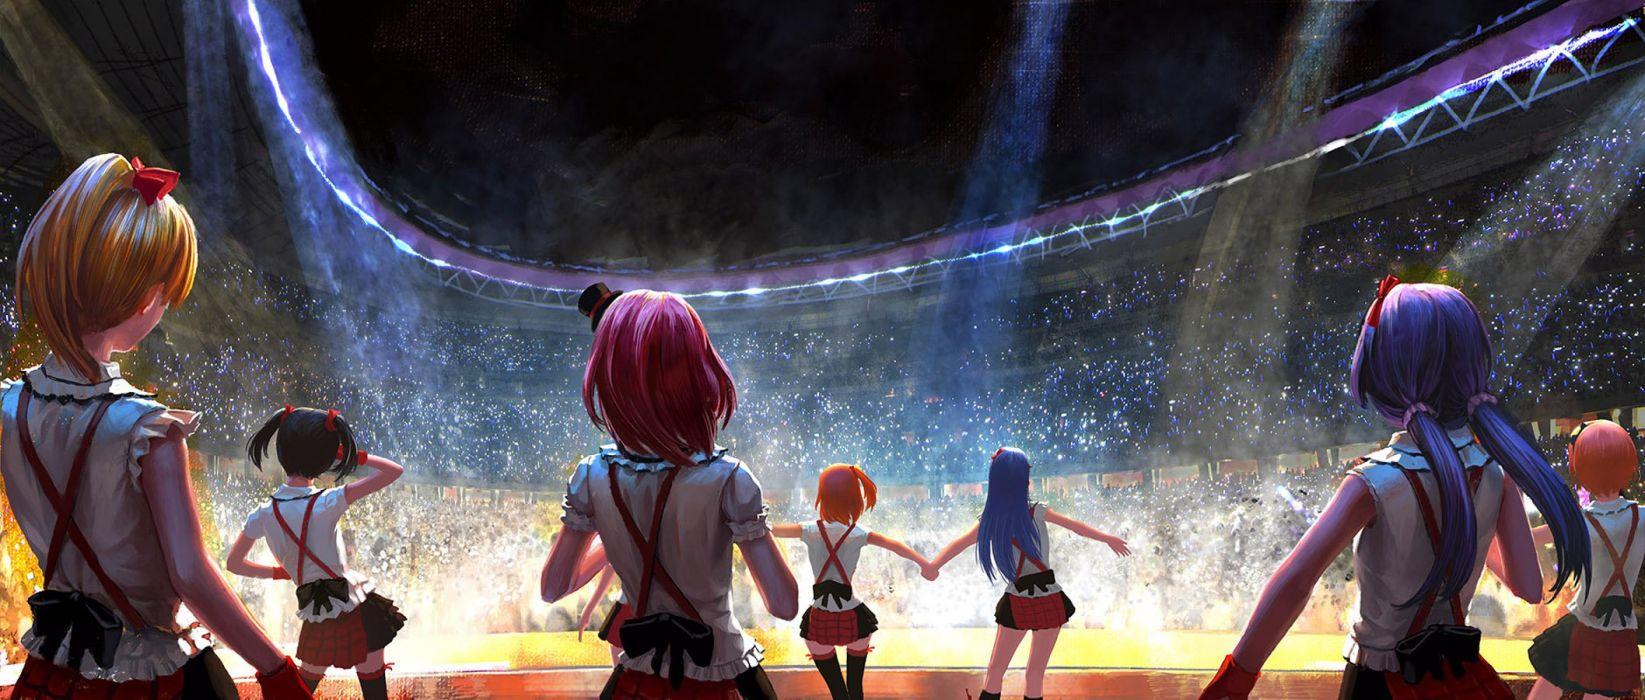 anime series group girls characters love live school idols music wallpaper